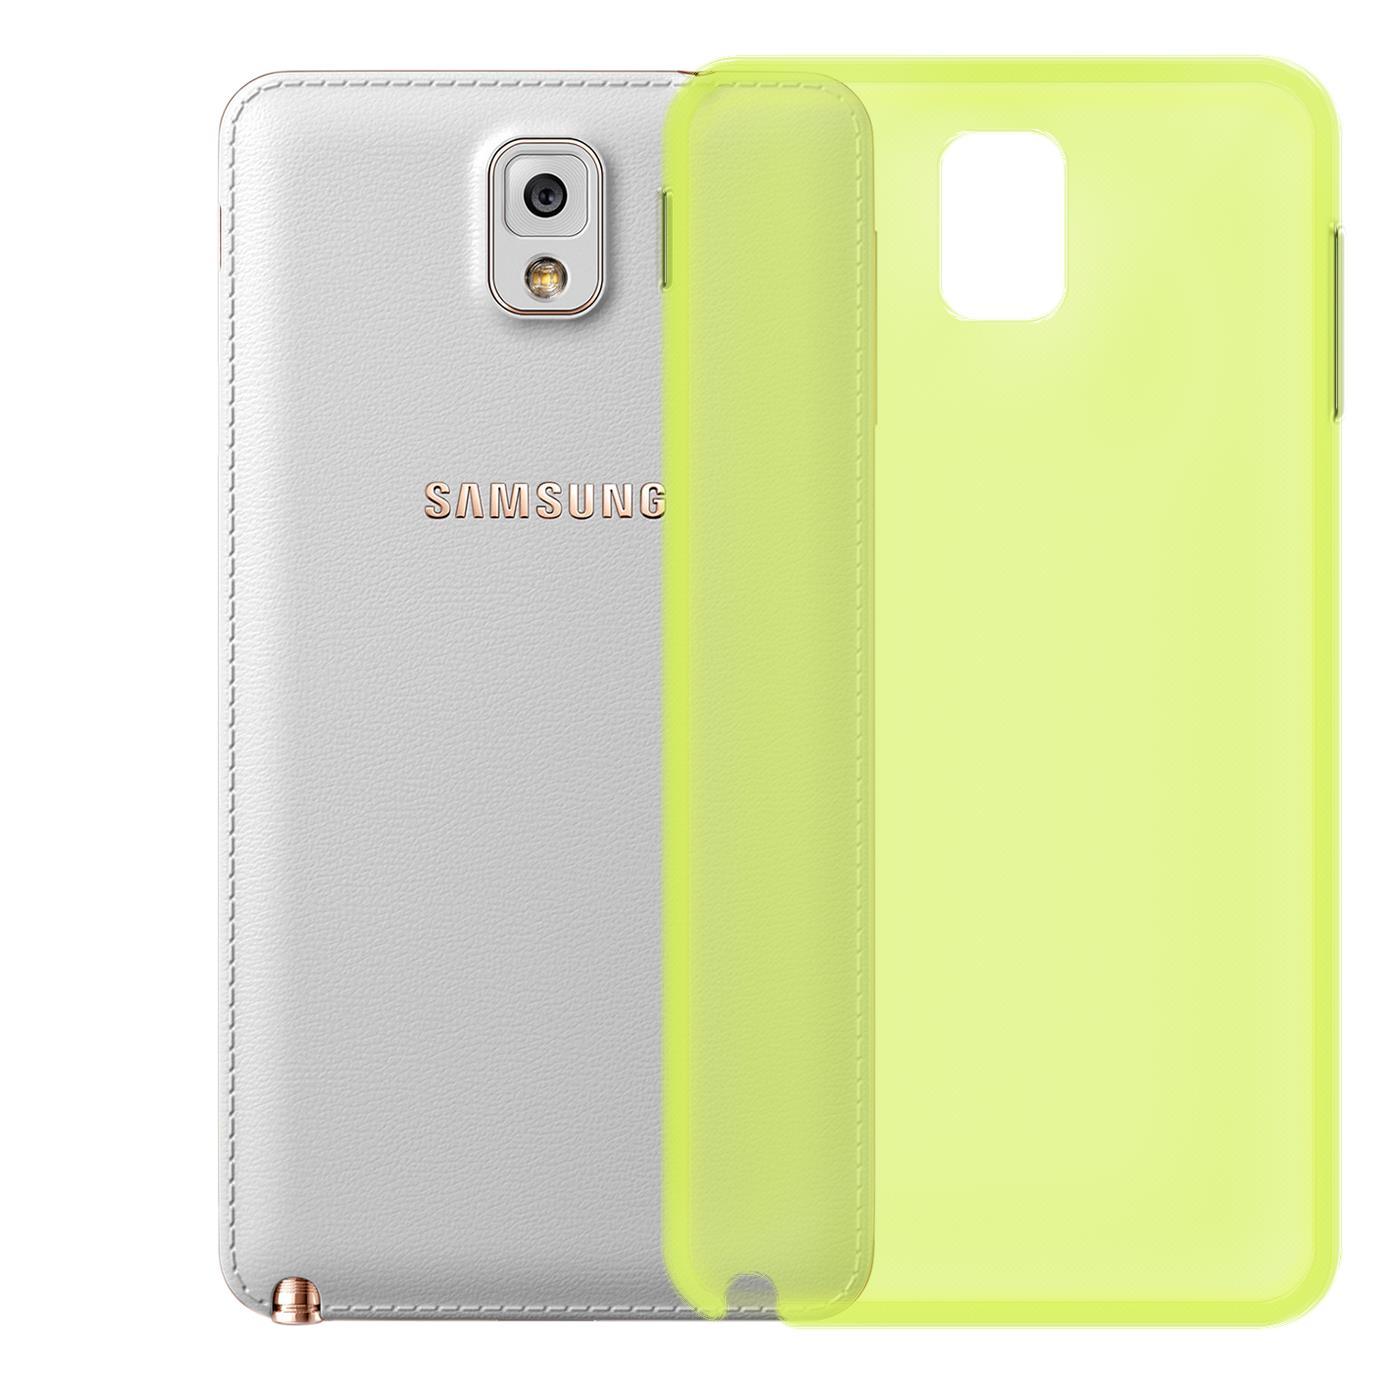 Samsung-Galaxy-Note-4-Thin-Silikon-Klar-Case-Cover-Ultra-Slim-Stossfeste-Gel Indexbild 12